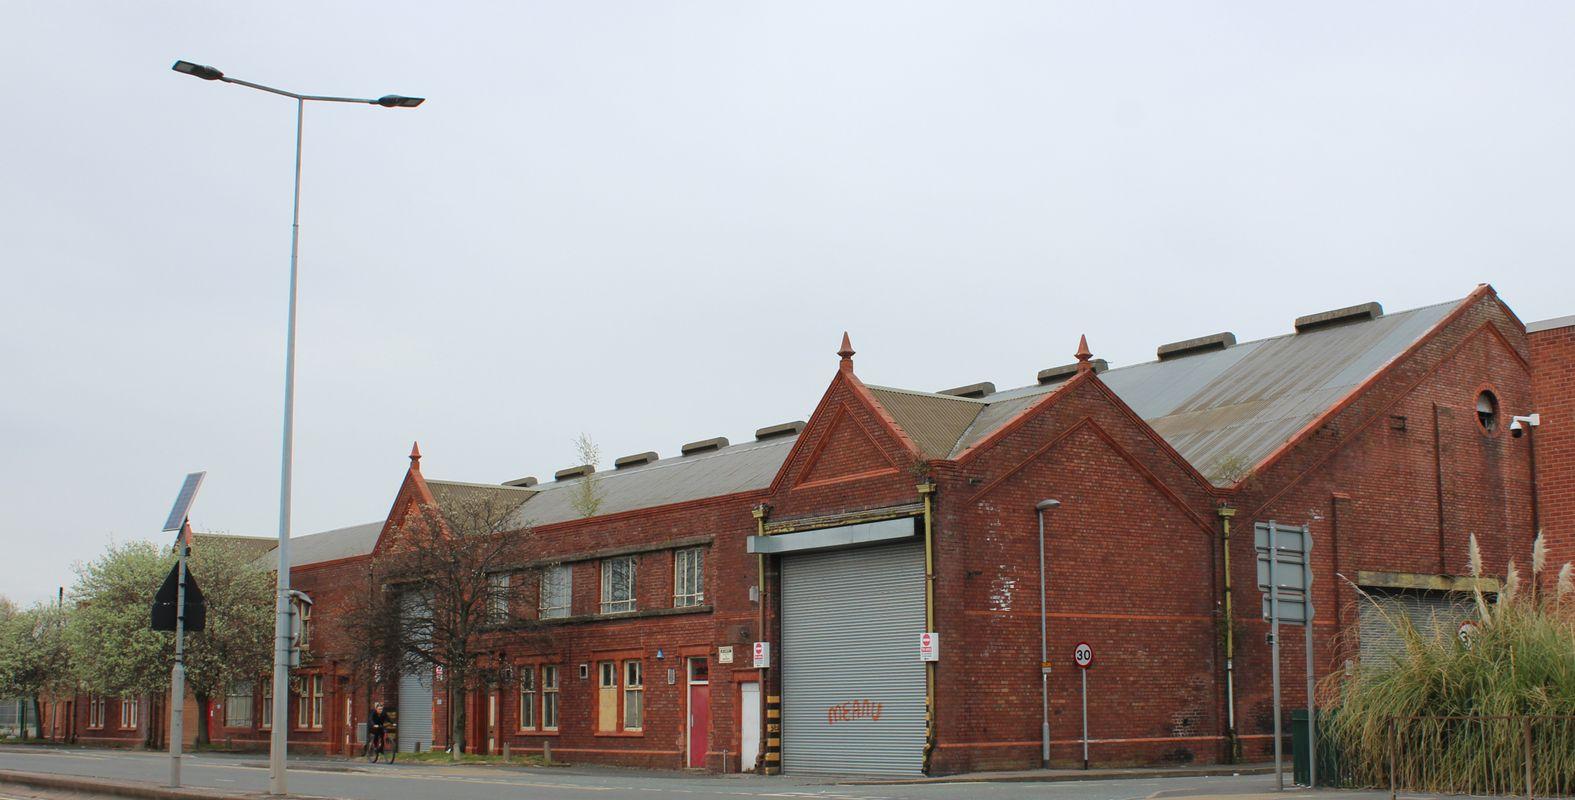 Widnes Bus Depot